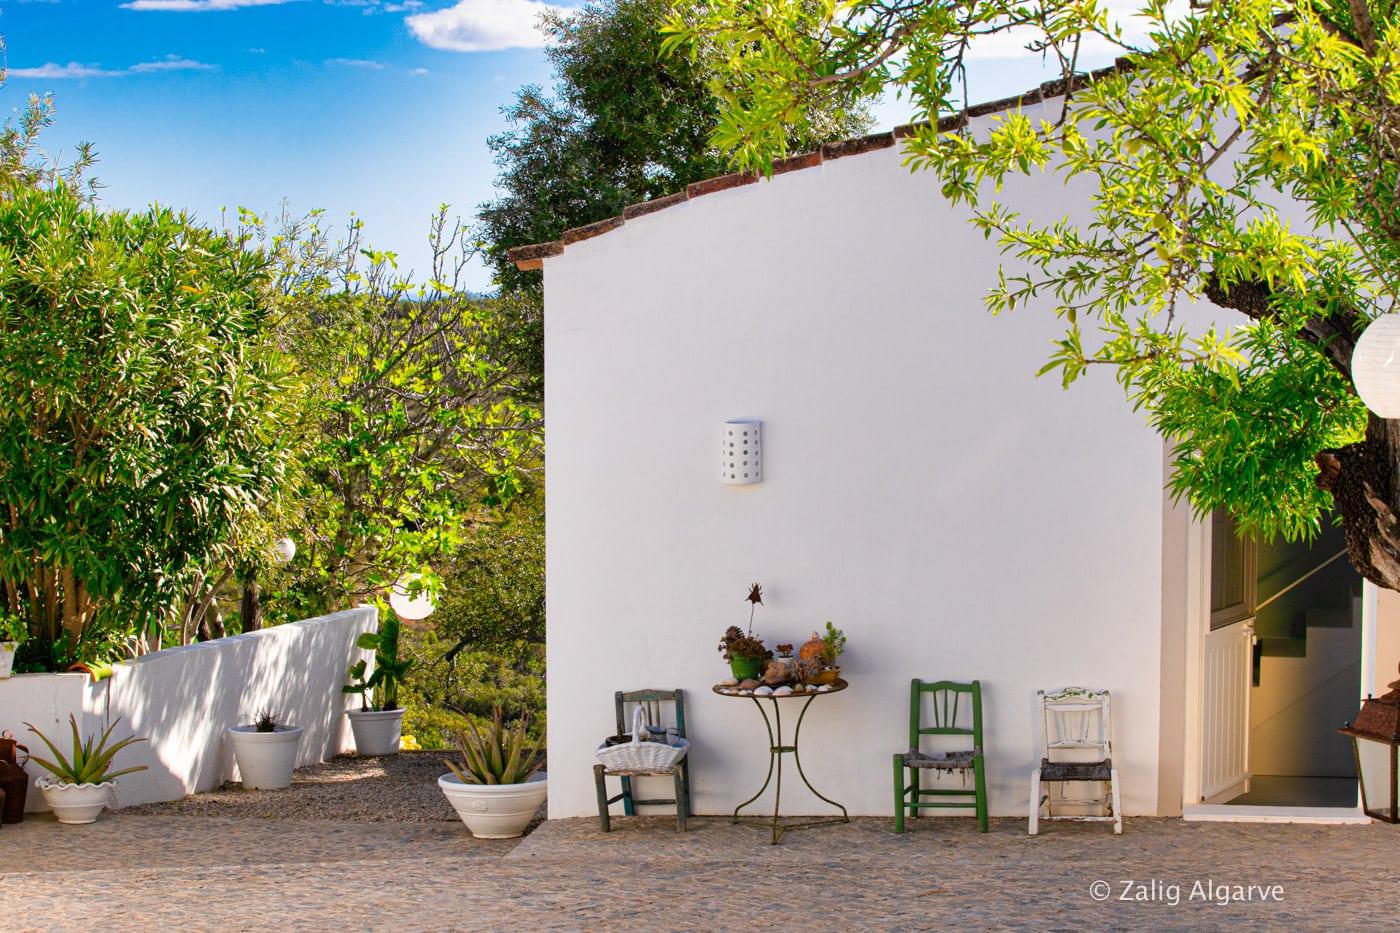 Casa-Alfarrobeira-Zalig-Algarve-55